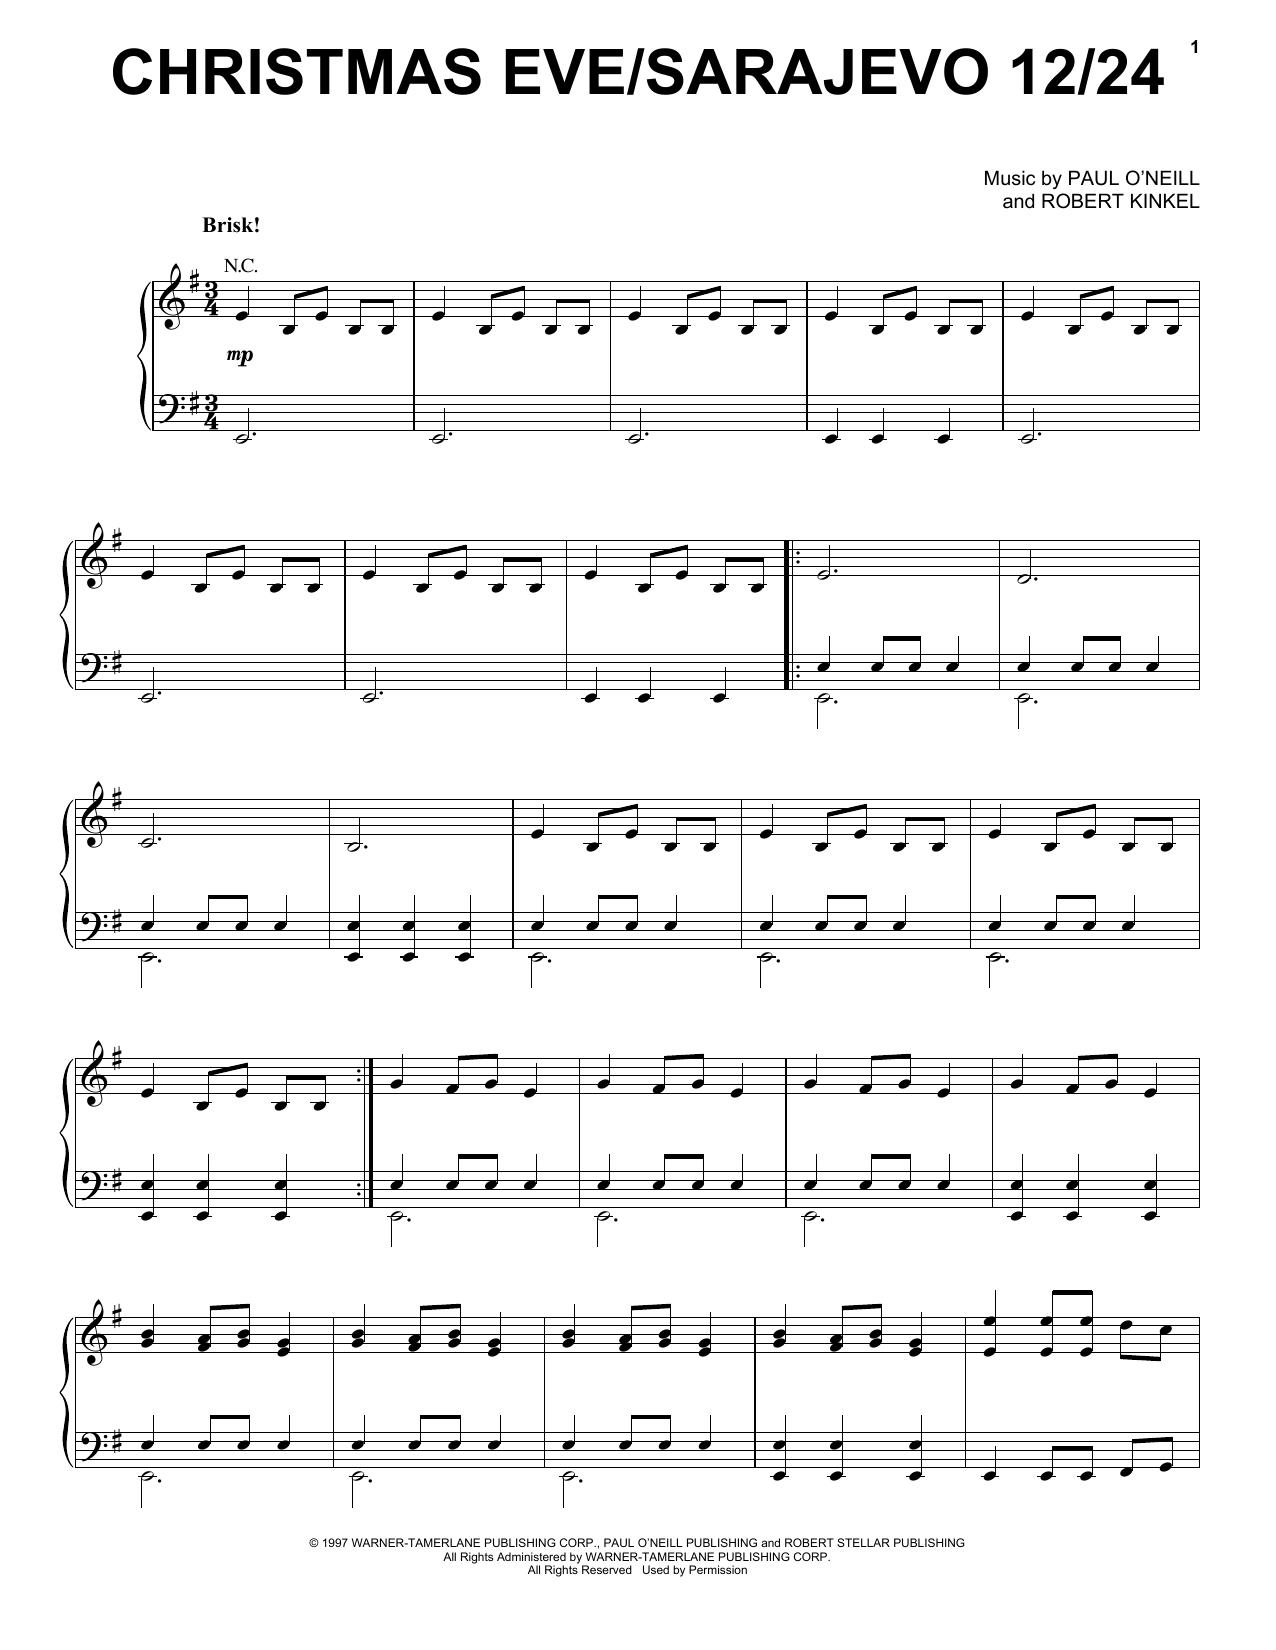 Christmas In Sarajevo.Christmas Eve Sarajevo 12 24 Piano Vocal Guitar Right Hand Melody